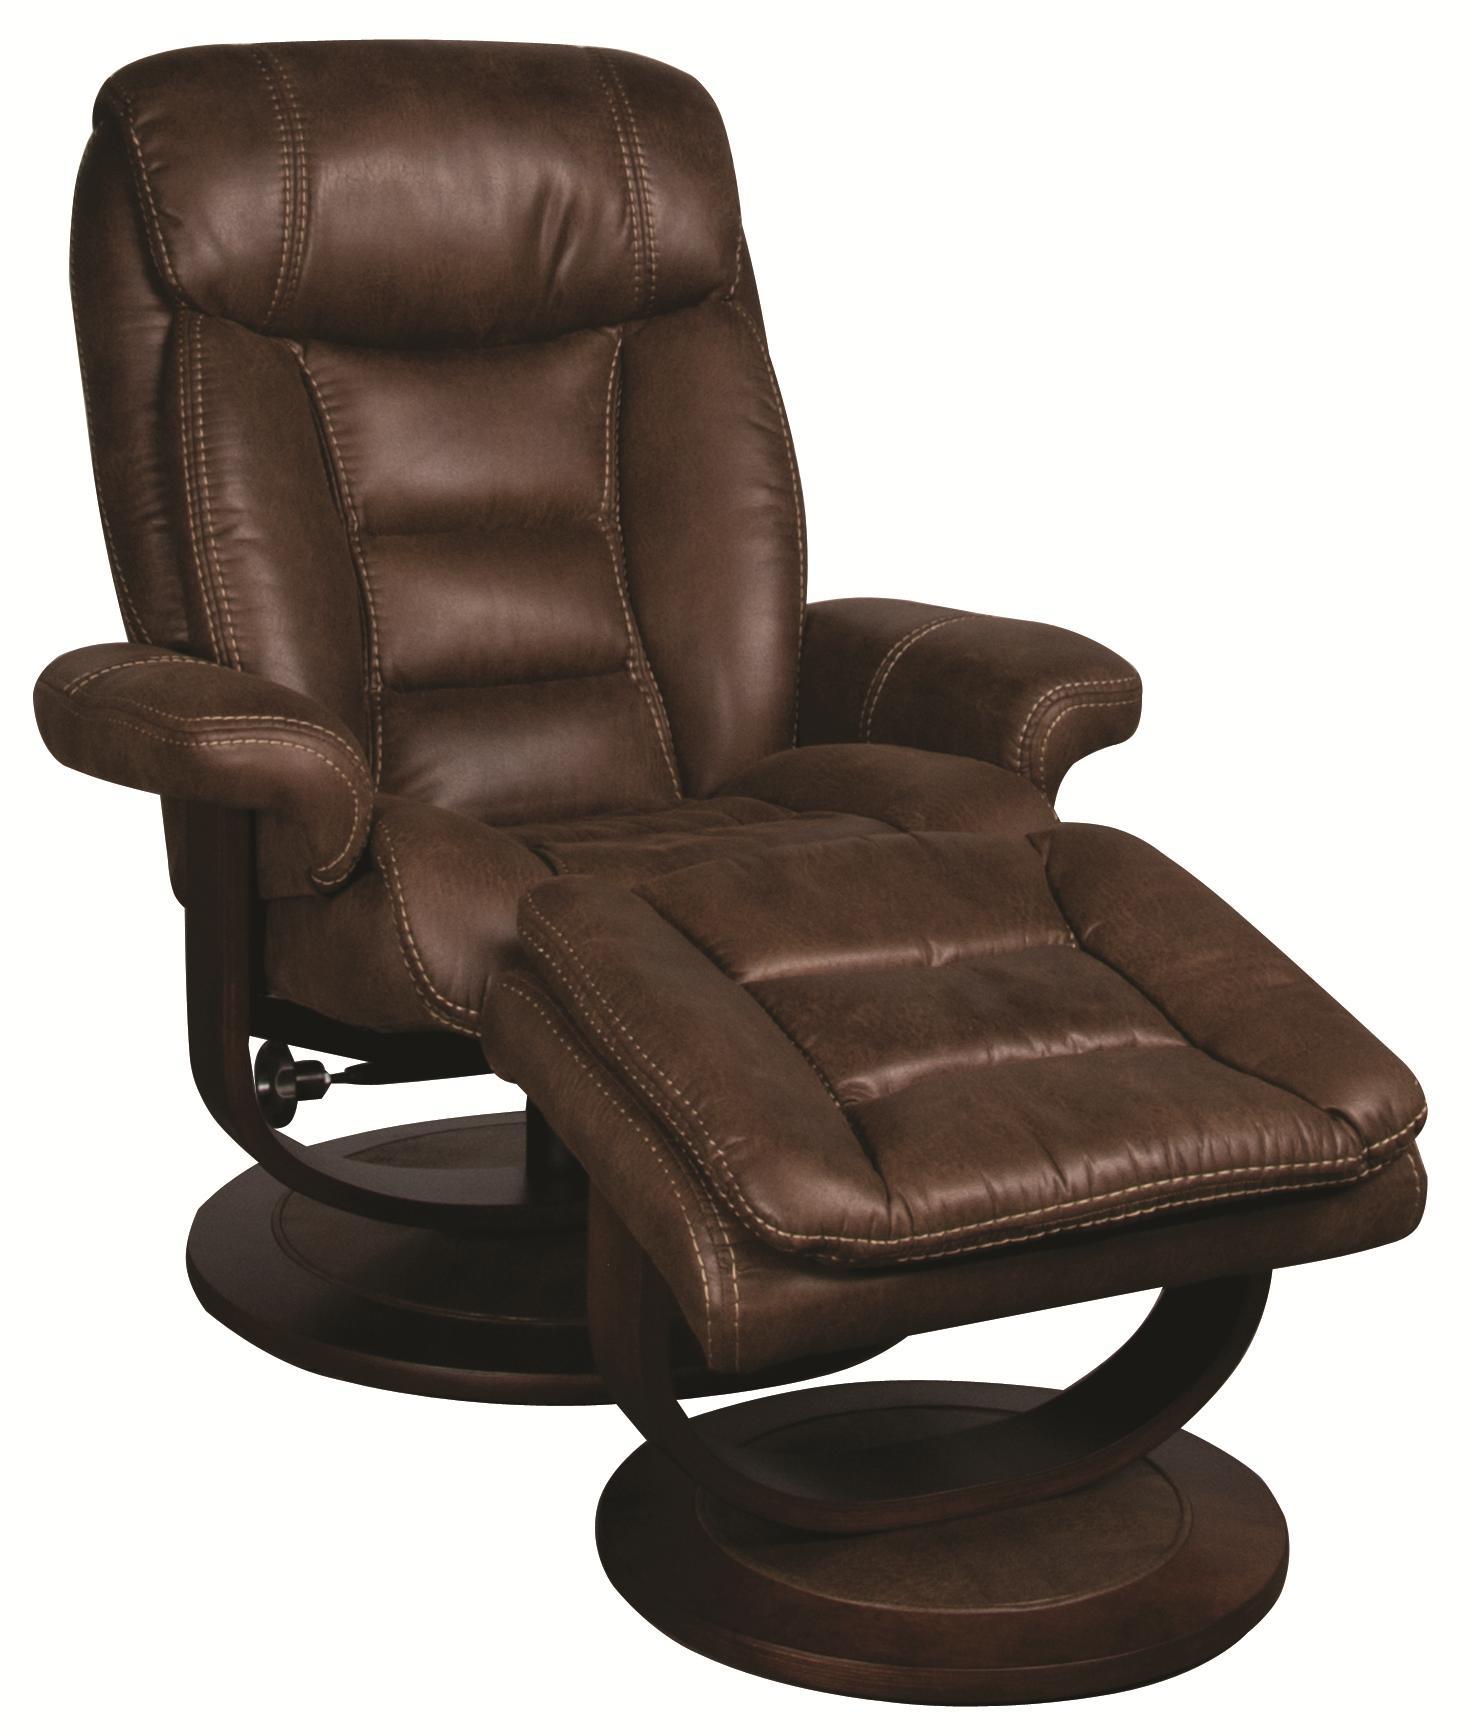 euro recliner chair fold up lawn chairs swivel mac motion bergen